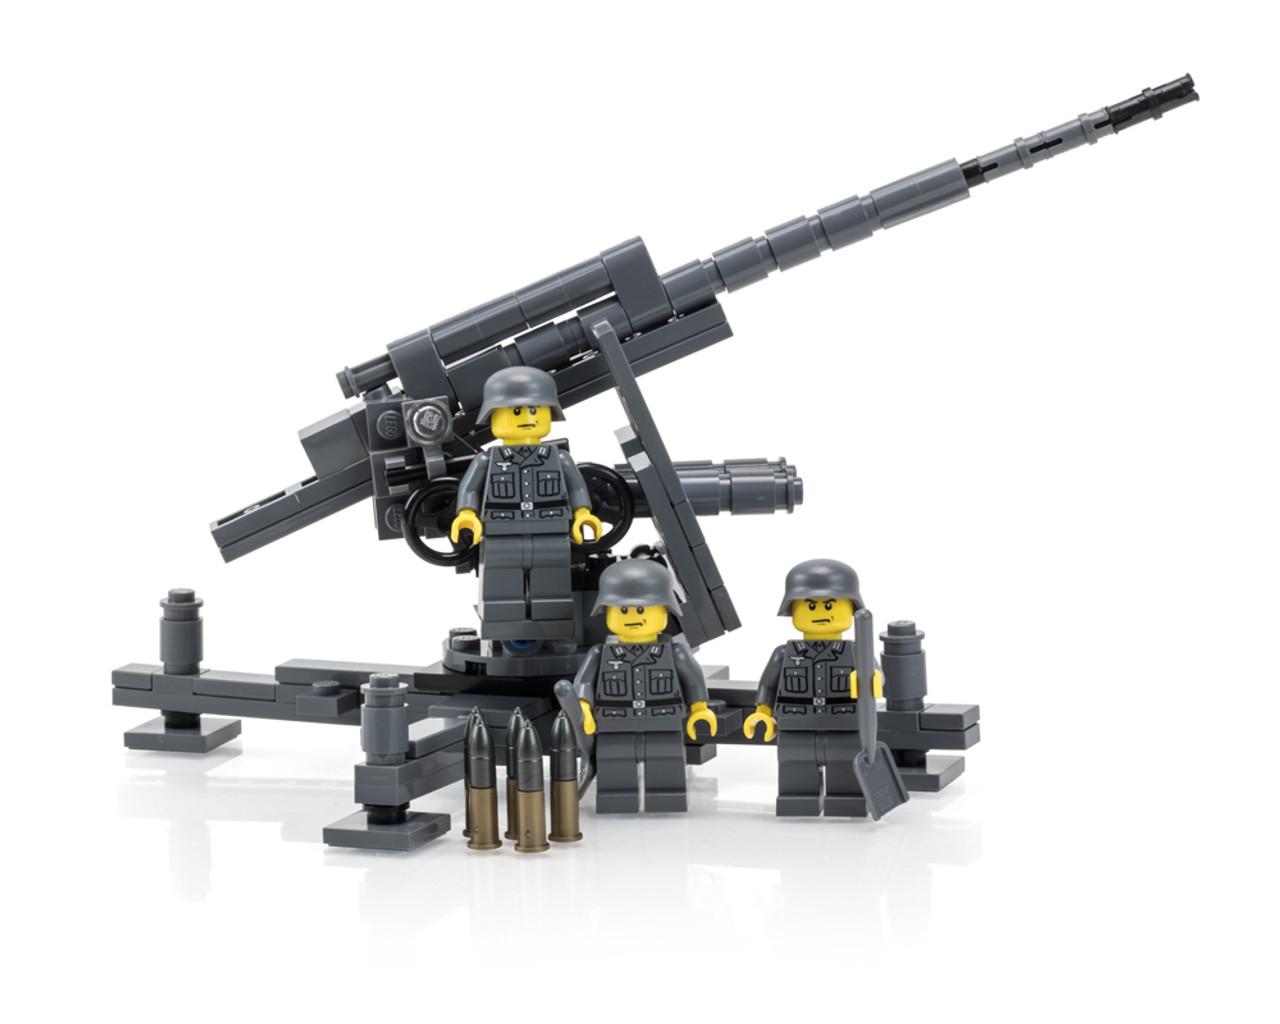 Flak 36 8.8 cm Anti-Aircraft Gun - Flakkorps Upgrade